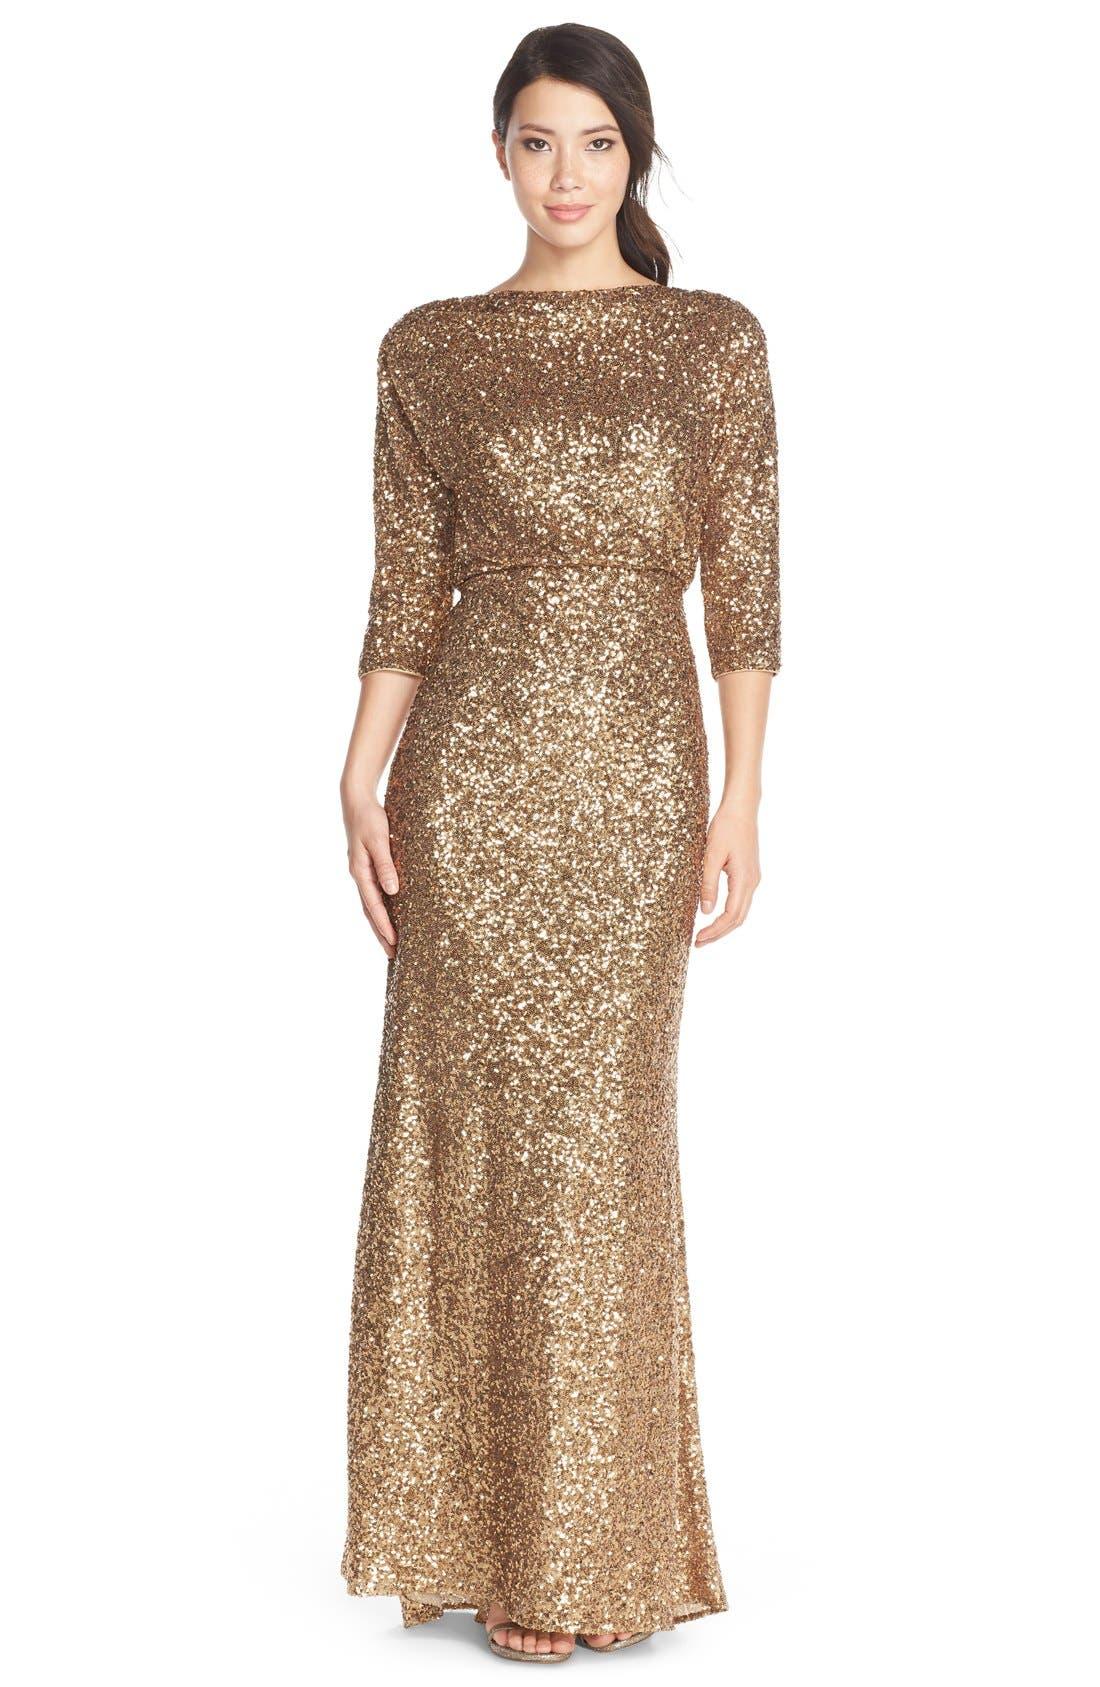 Alternate Image 1 Selected - Badgley Mischka Sequin Blouson Gown